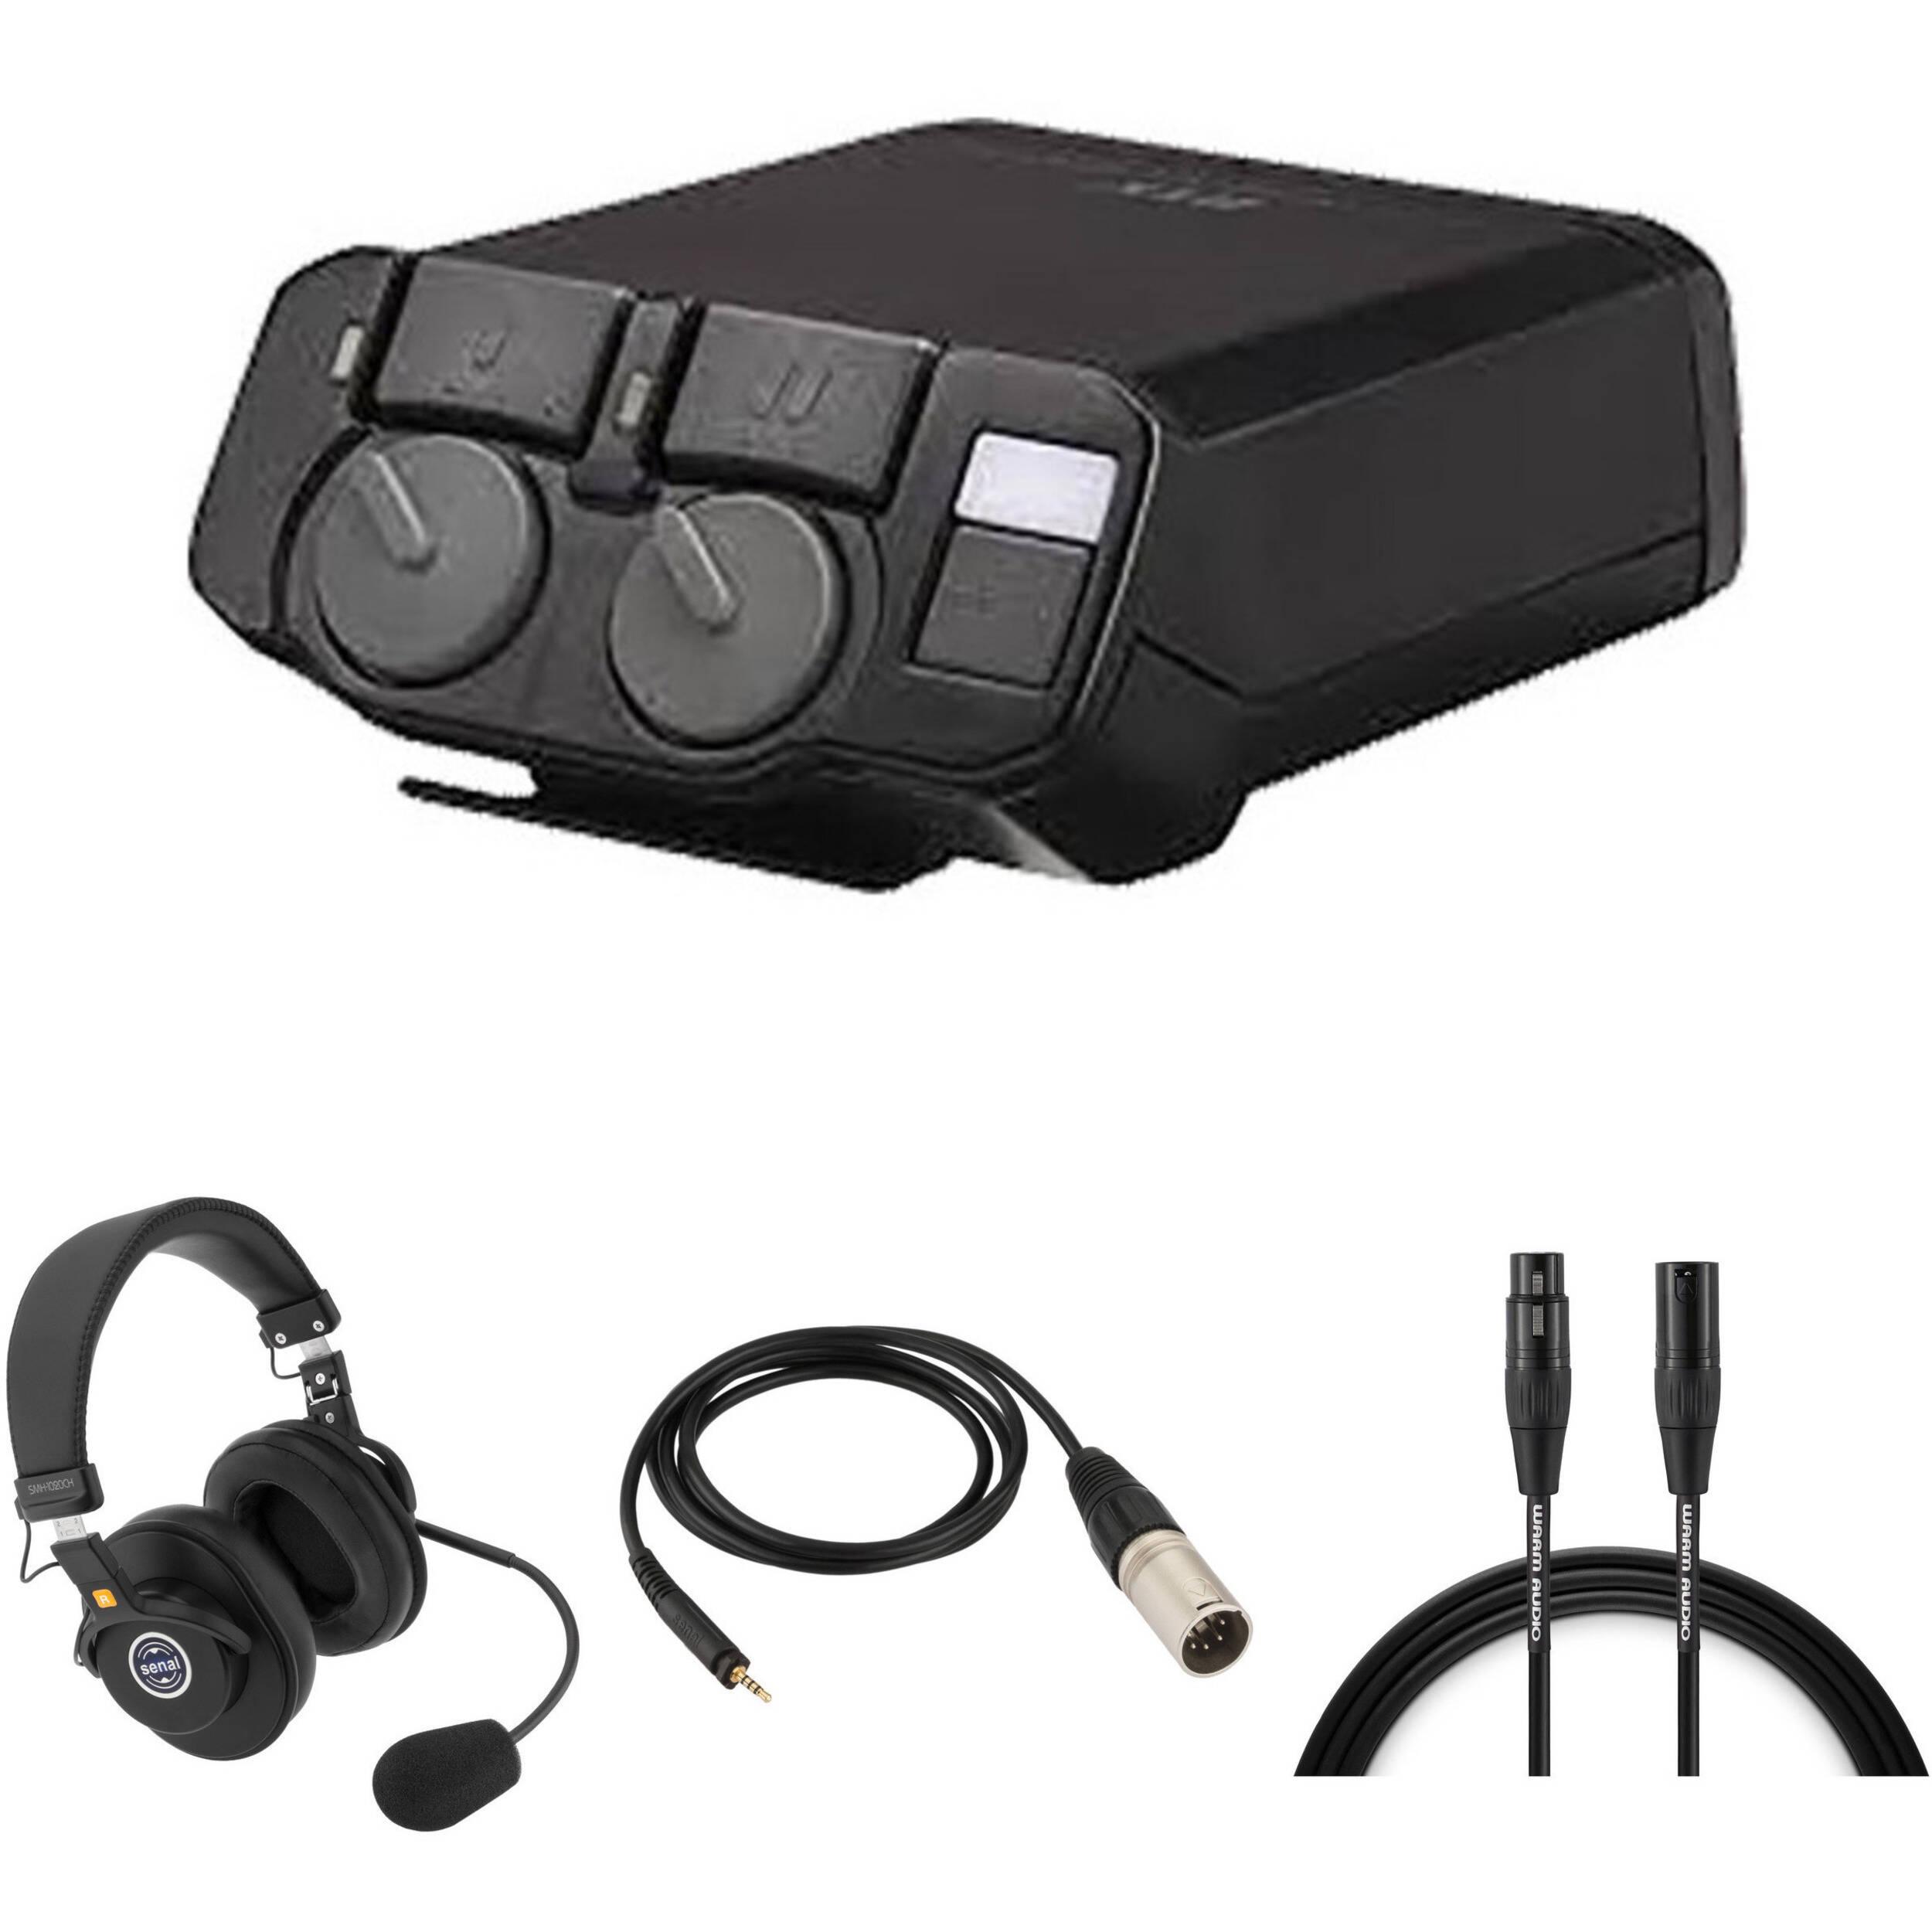 Telex RTS 2-Channel Portable Beltpack Communications Kit B&H